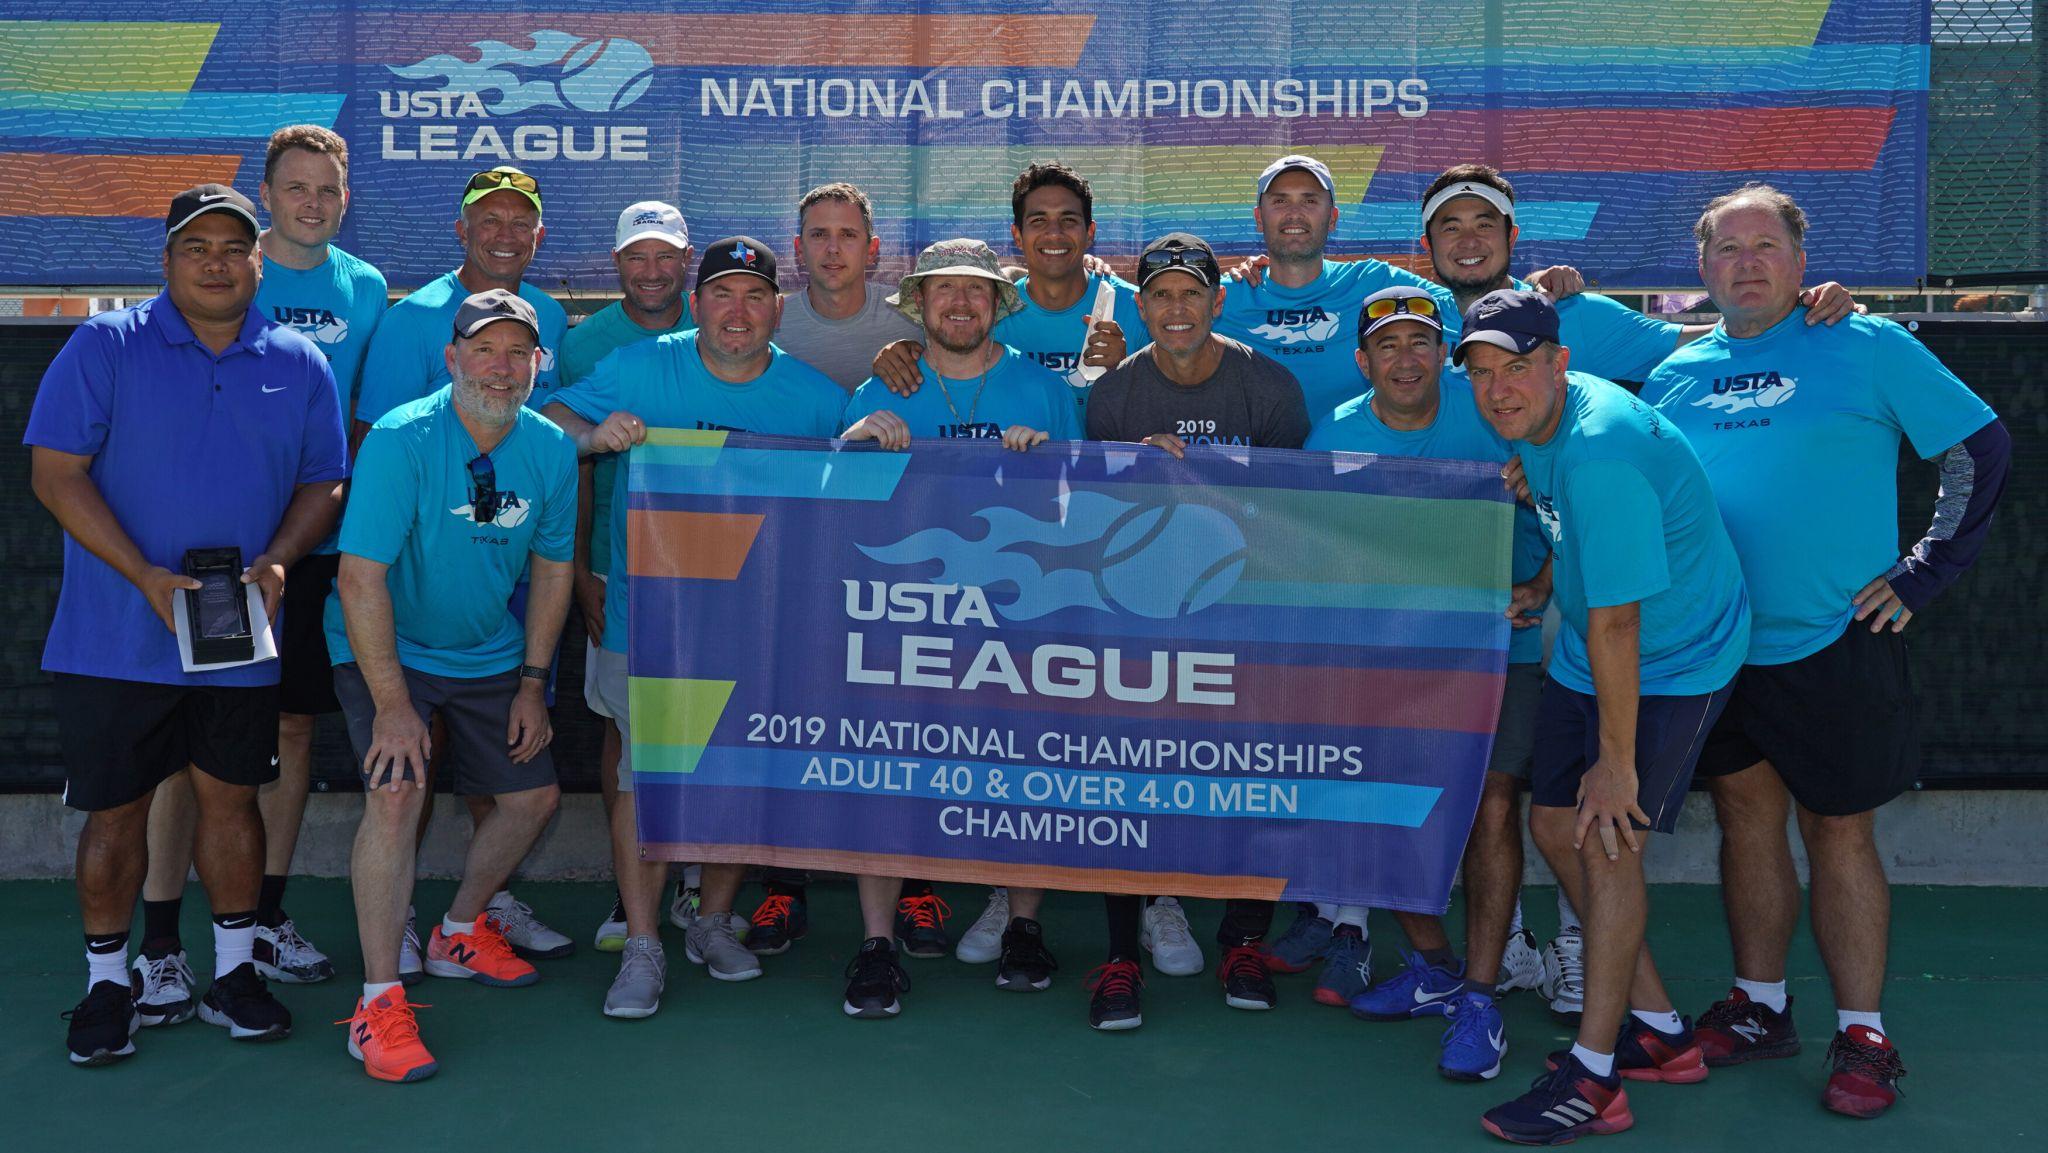 The Woodlands men's tennis team captures USTA adult national title